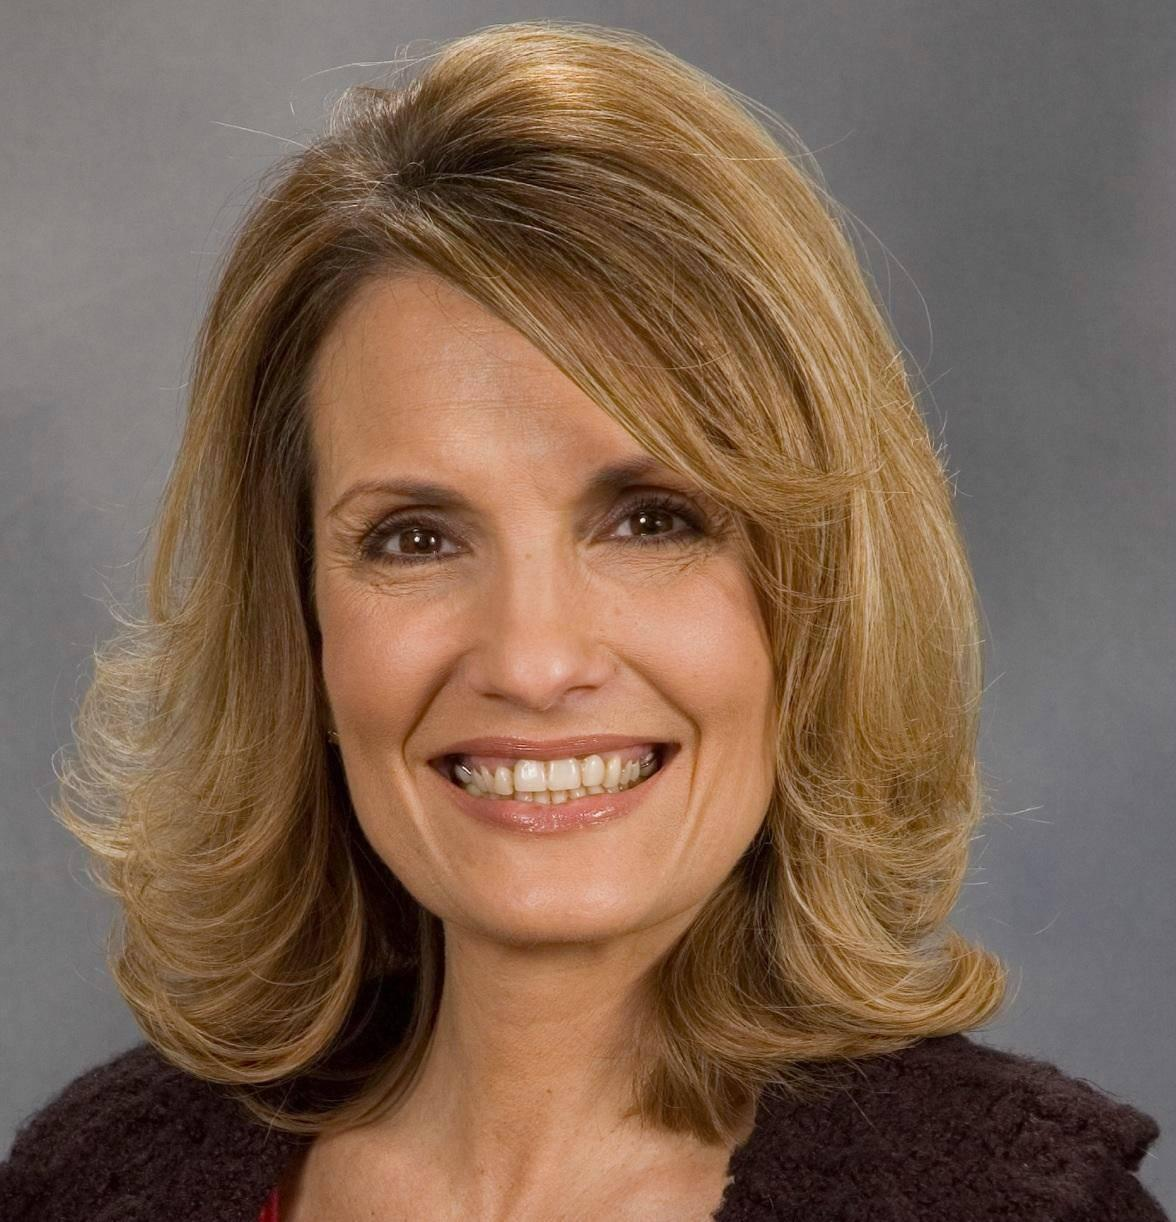 Janine undefined Nielsen